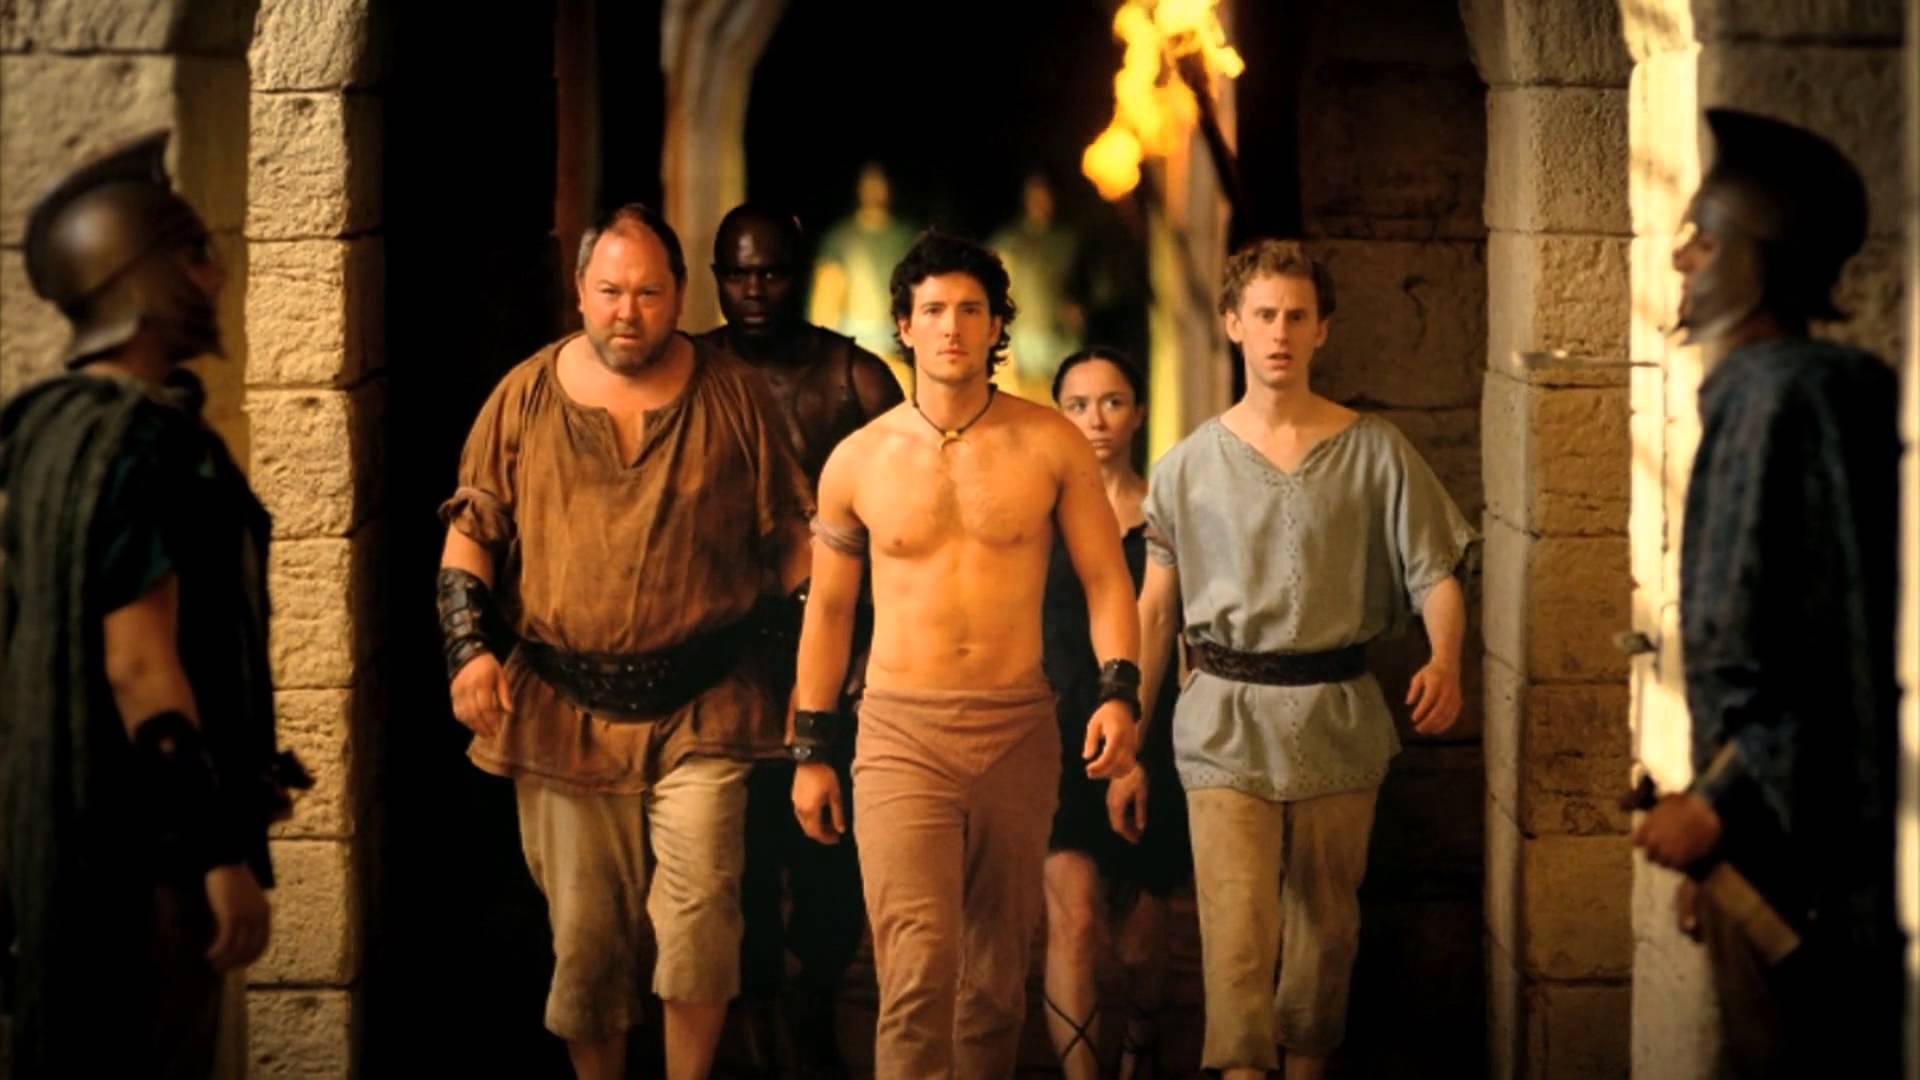 Hércules, Jason e Pitágoras